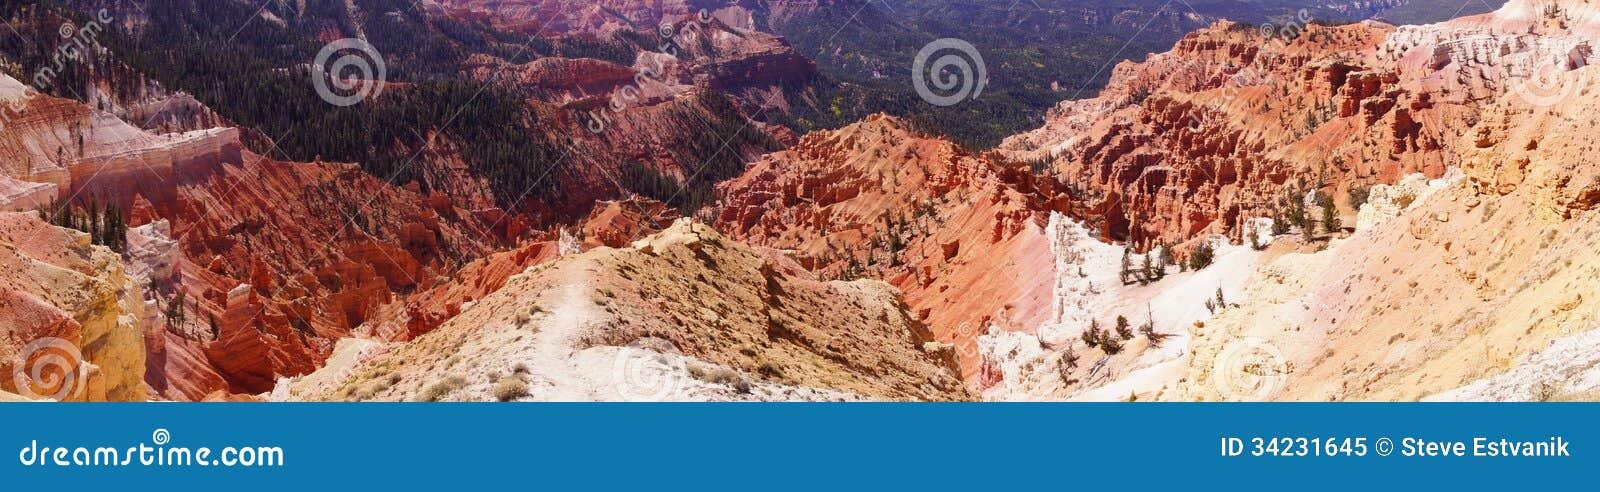 Panorama, fantasticly eroded red Navajo sandstone pinnacles